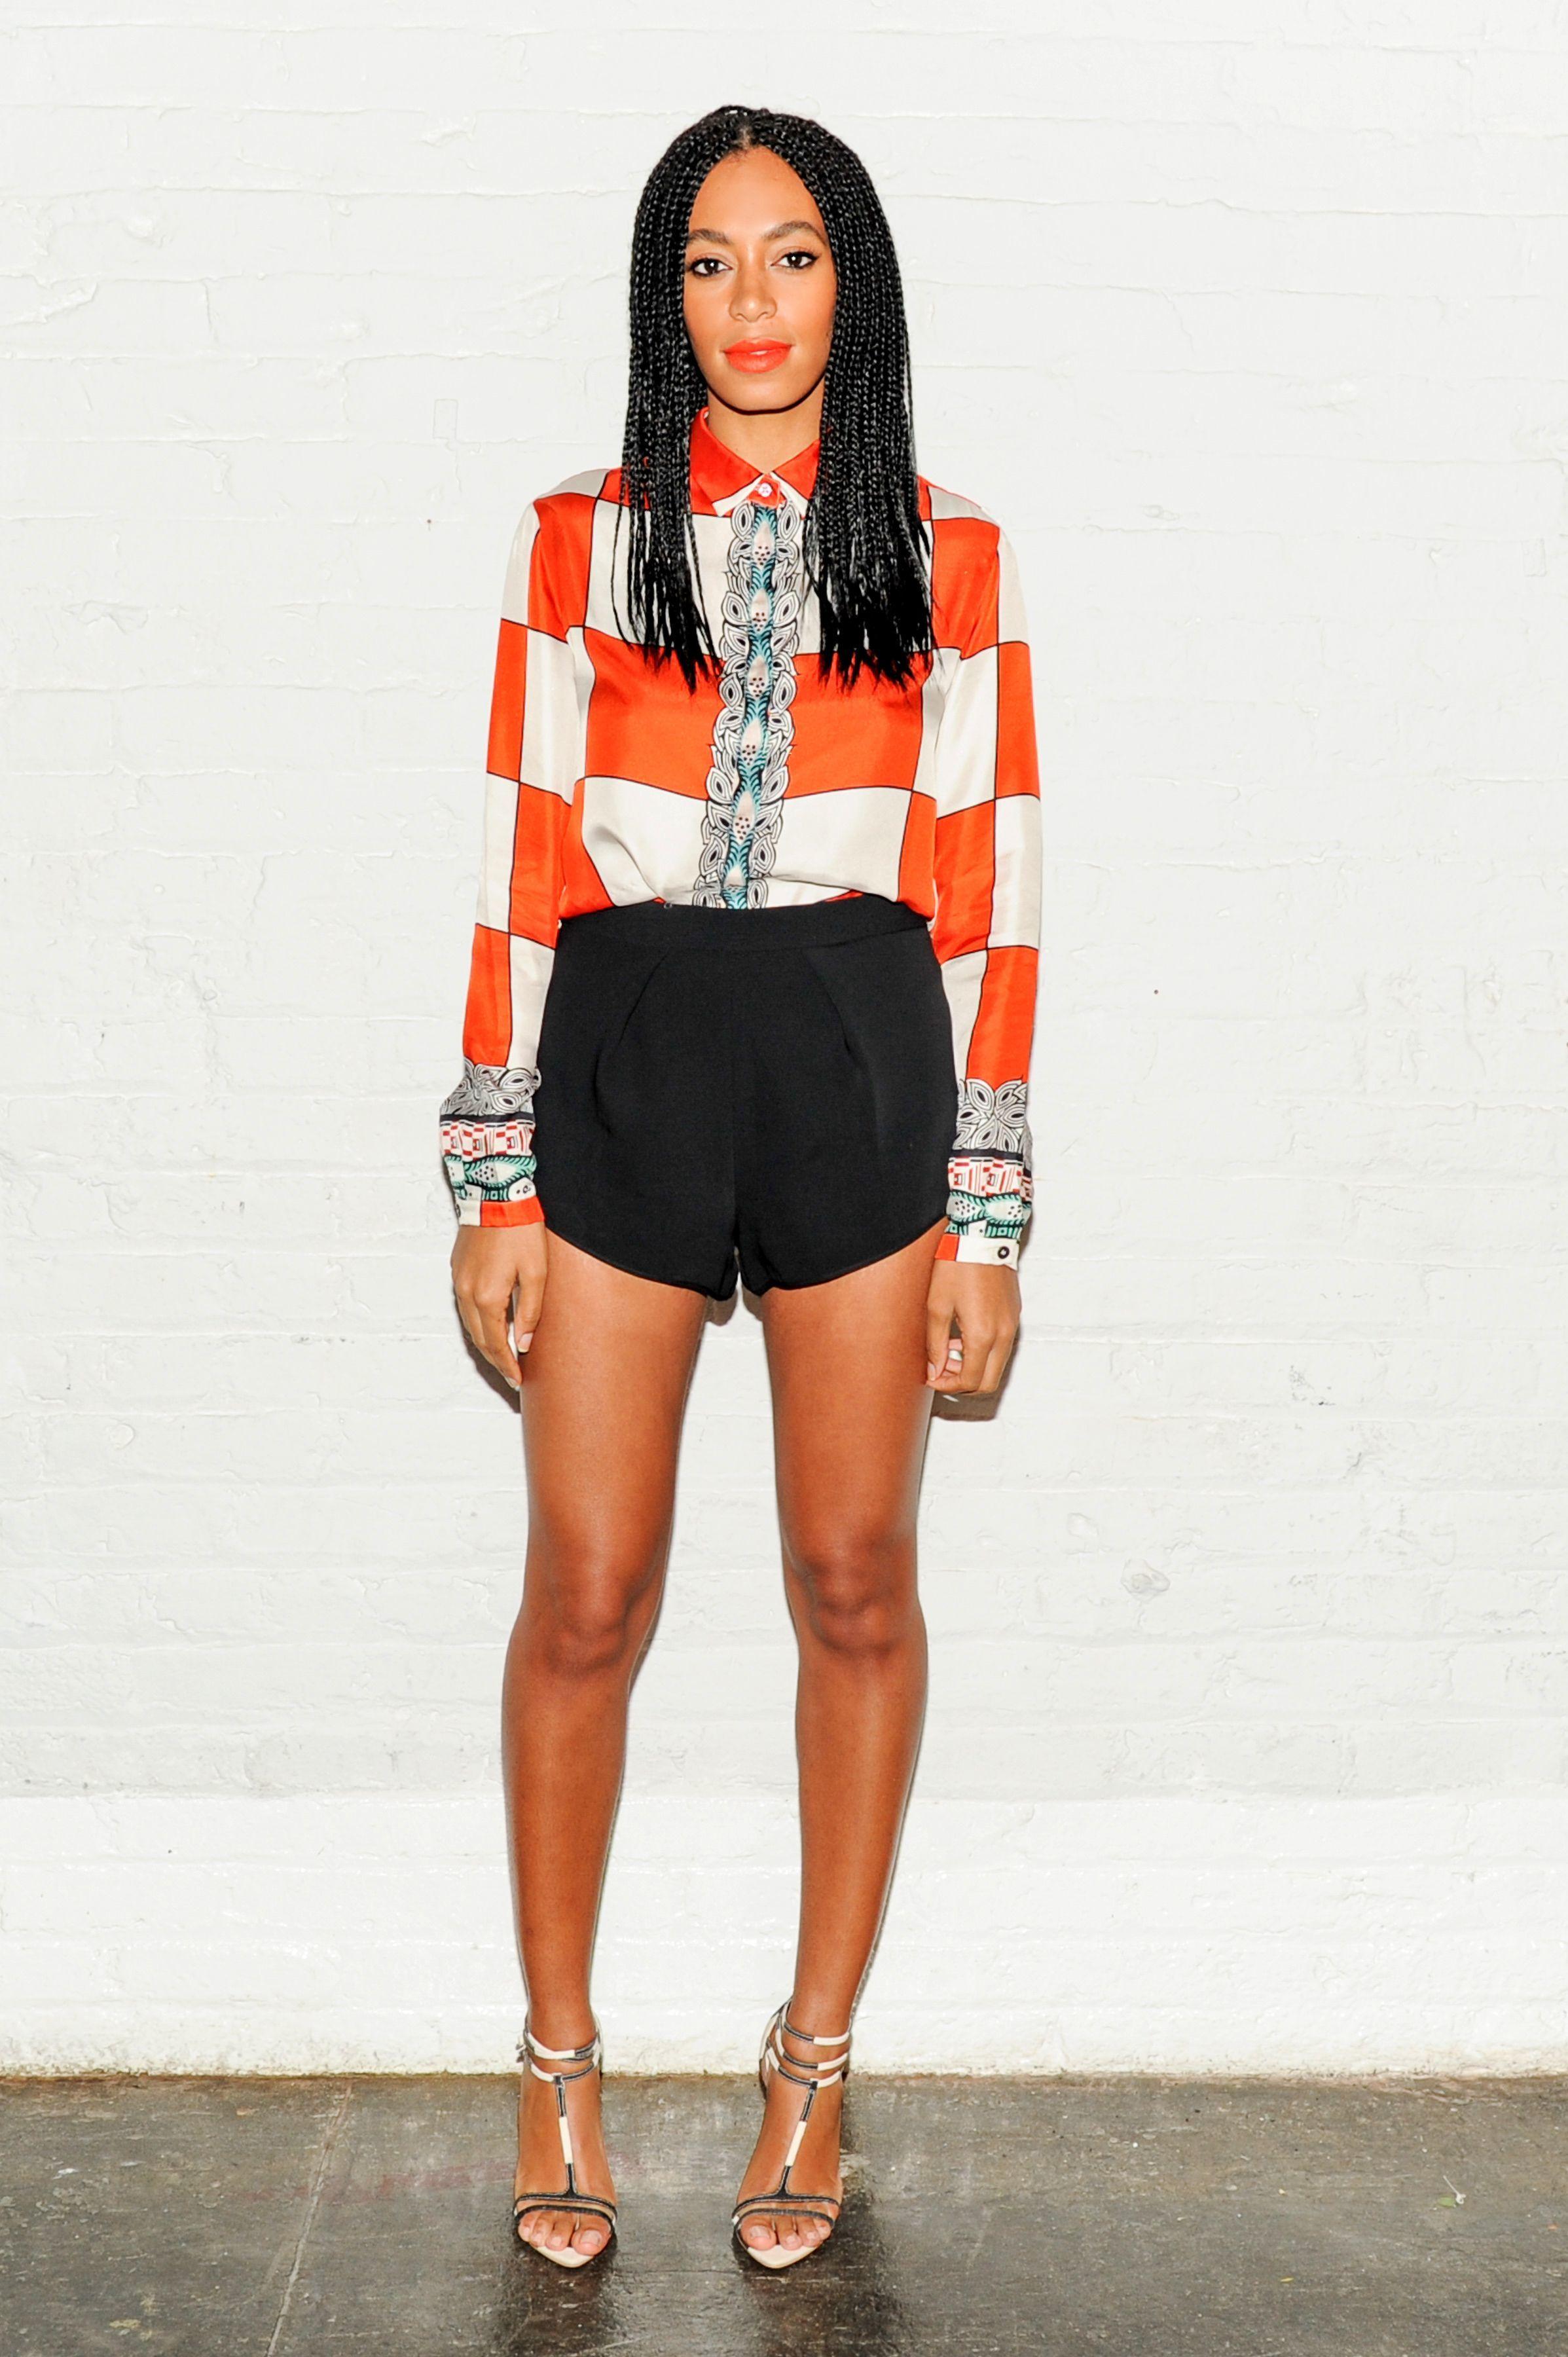 Solange Knowles short shorts